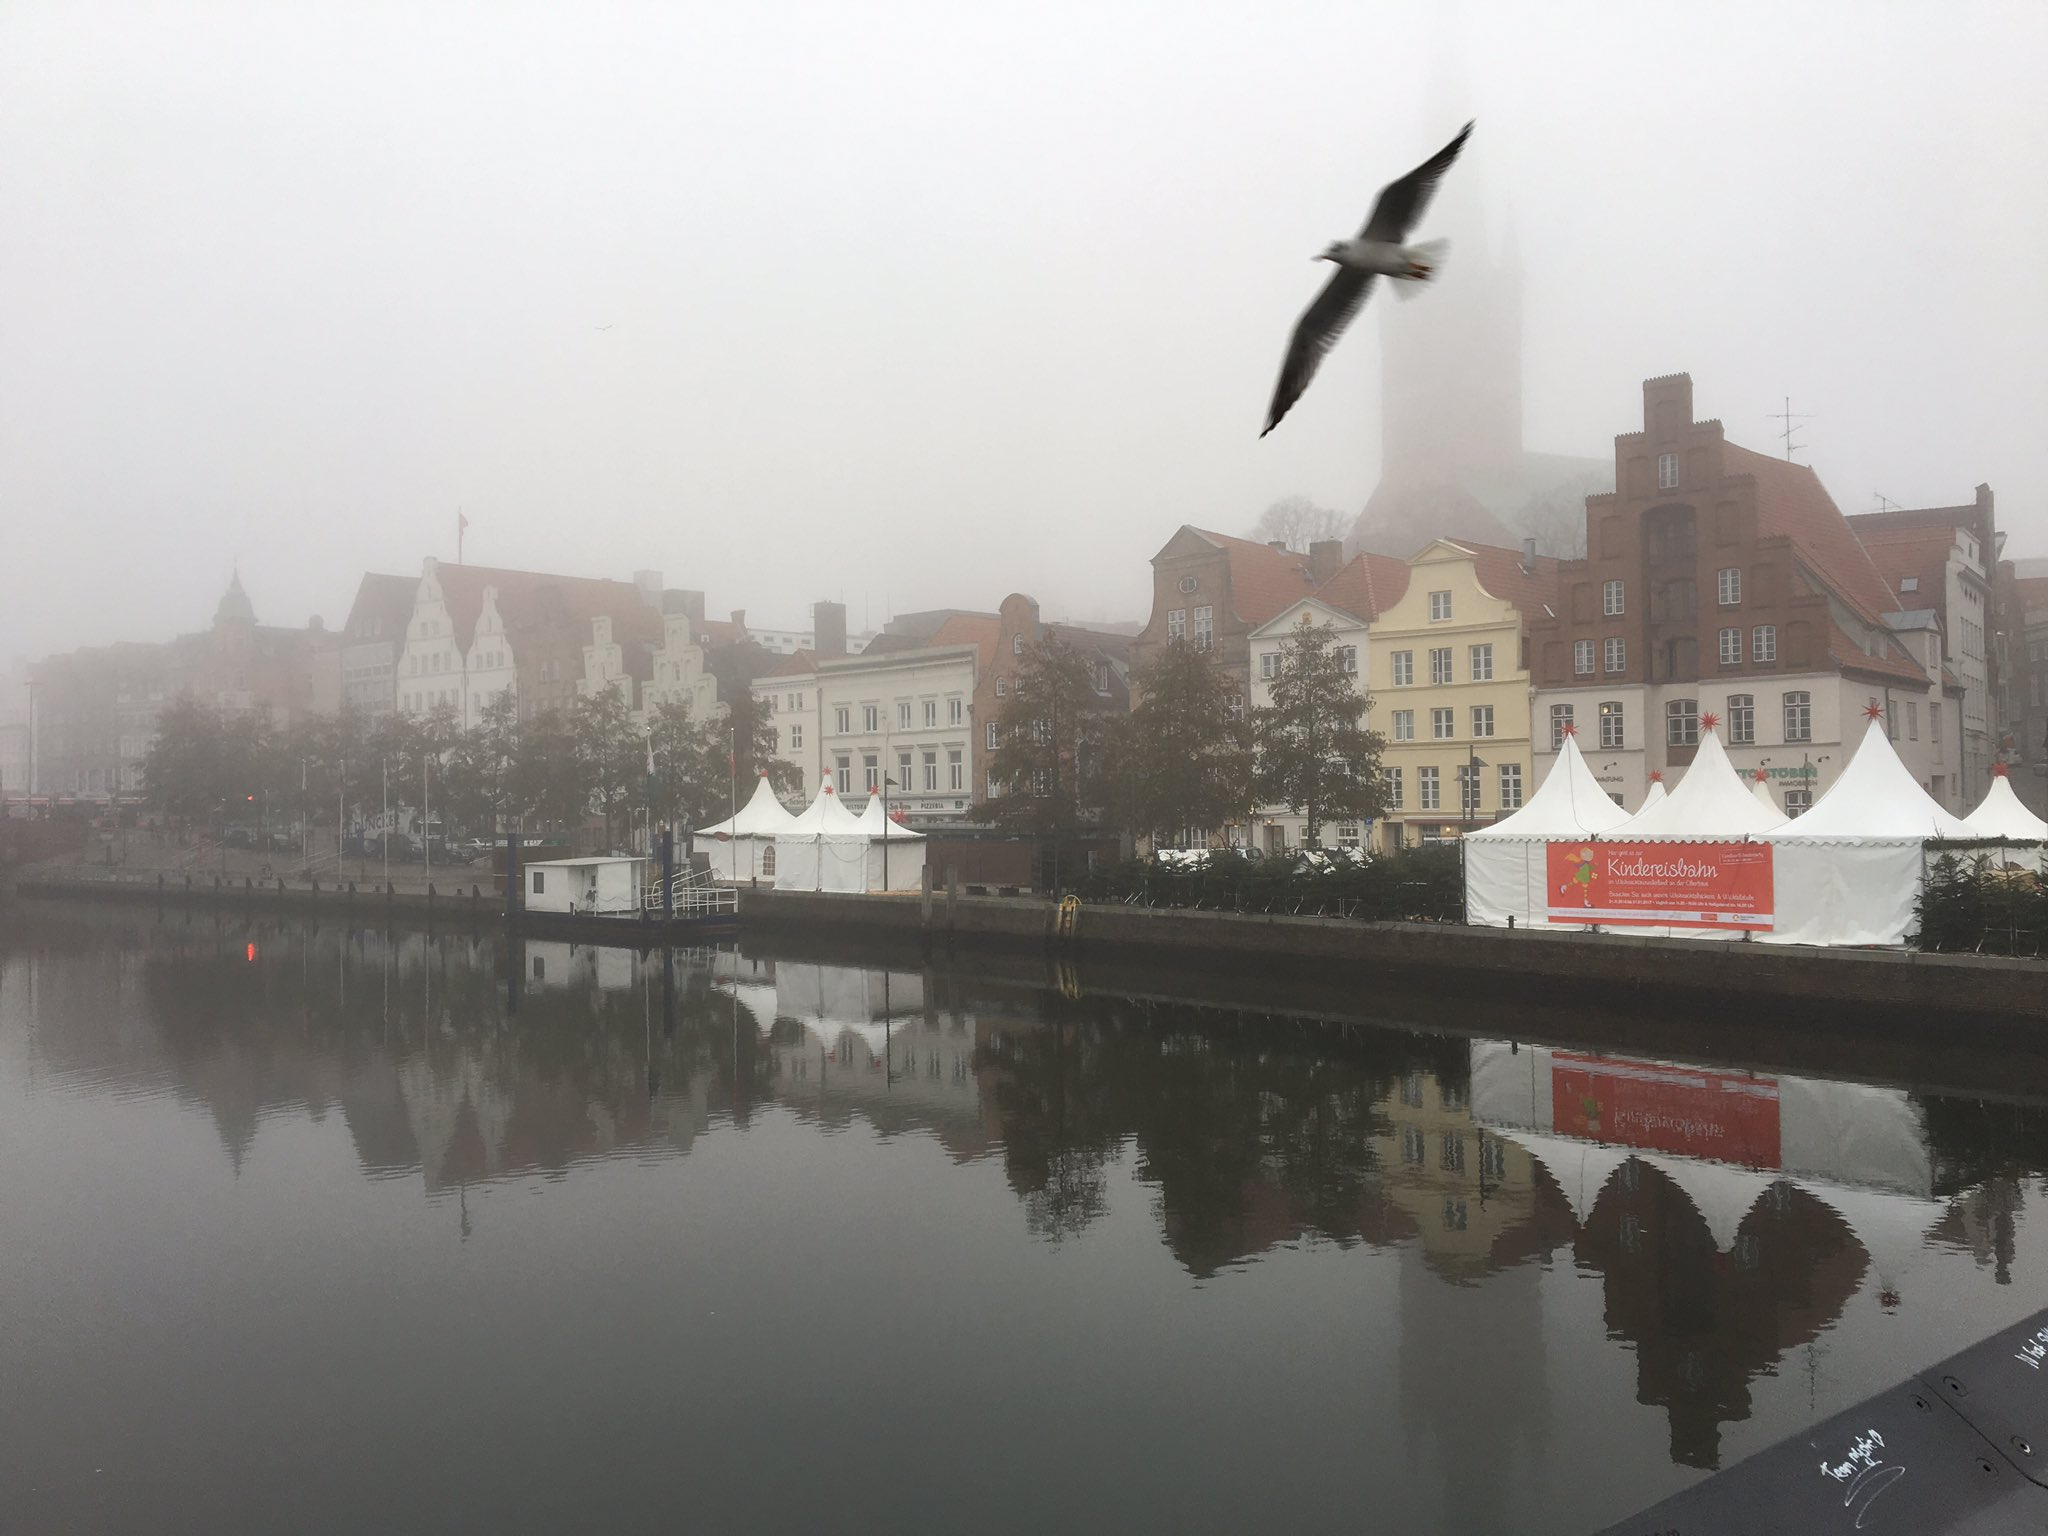 Guten Morgen Lübeck! #bchl16 https://t.co/RAQCNaMXE0